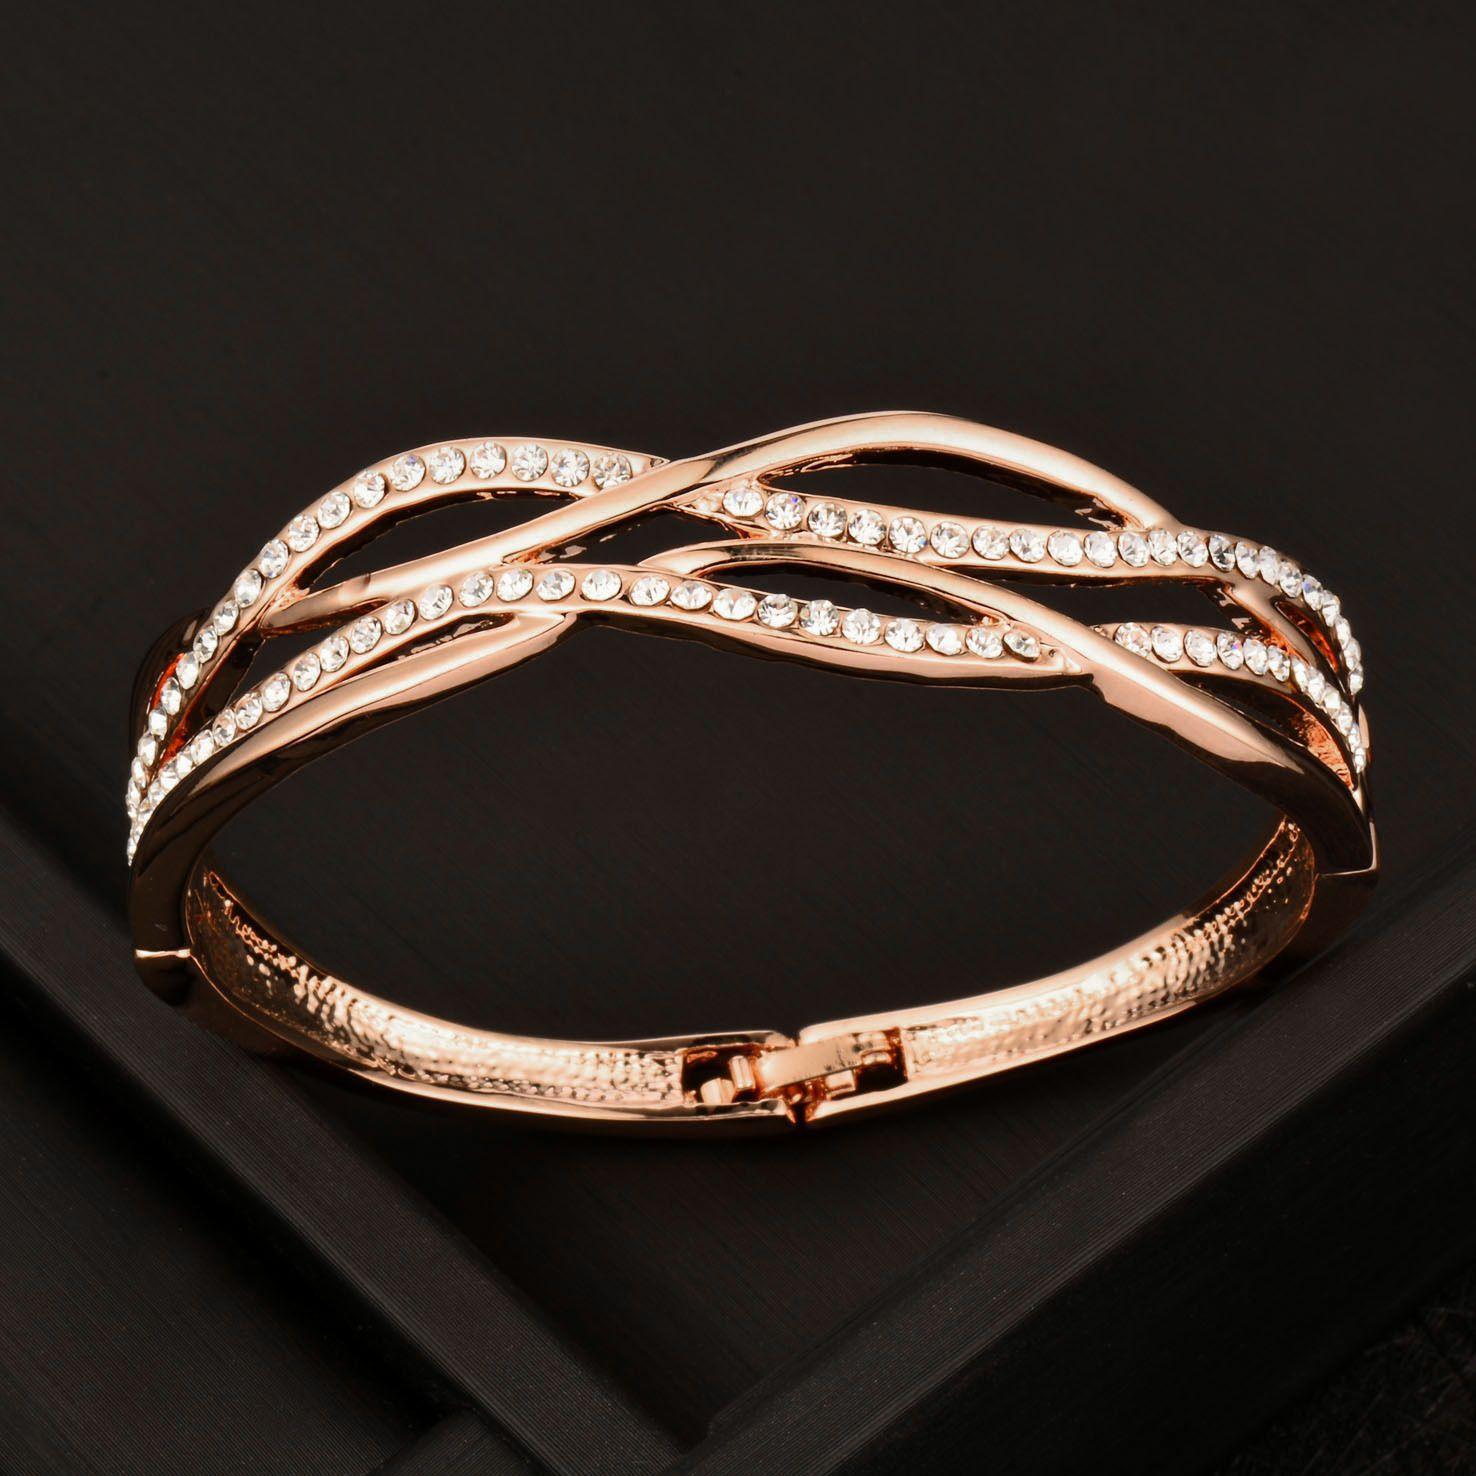 Luxury design crystal hollow cross women bangle bracelets k rose